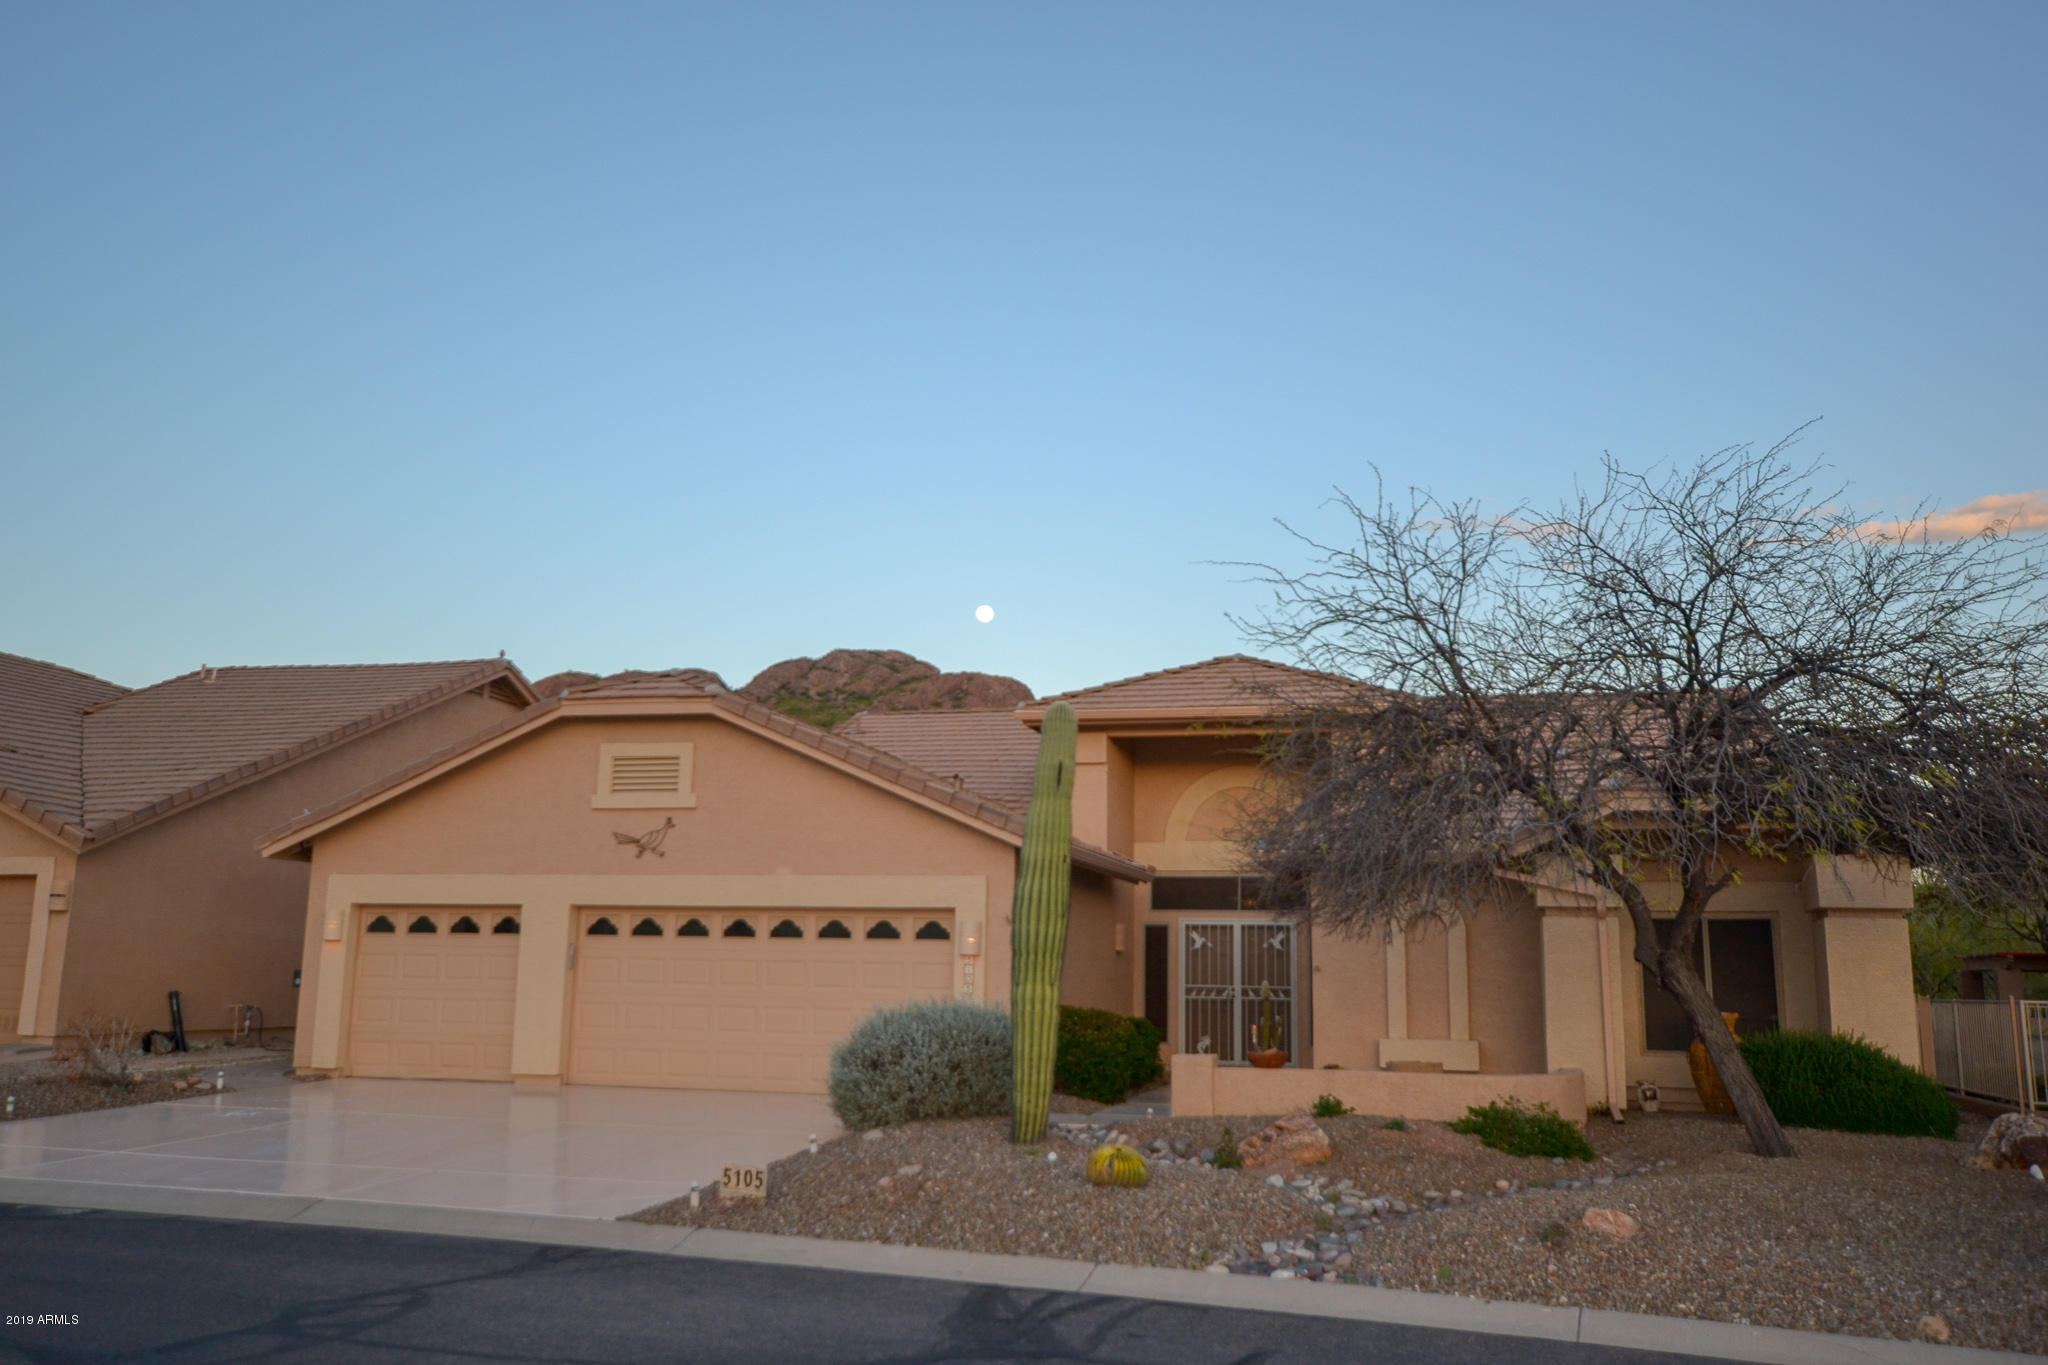 MLS 5898979 5105 S Crested Saguaro Lane, Gold Canyon, AZ 85118 Gold Canyon AZ Mountainbrook Village